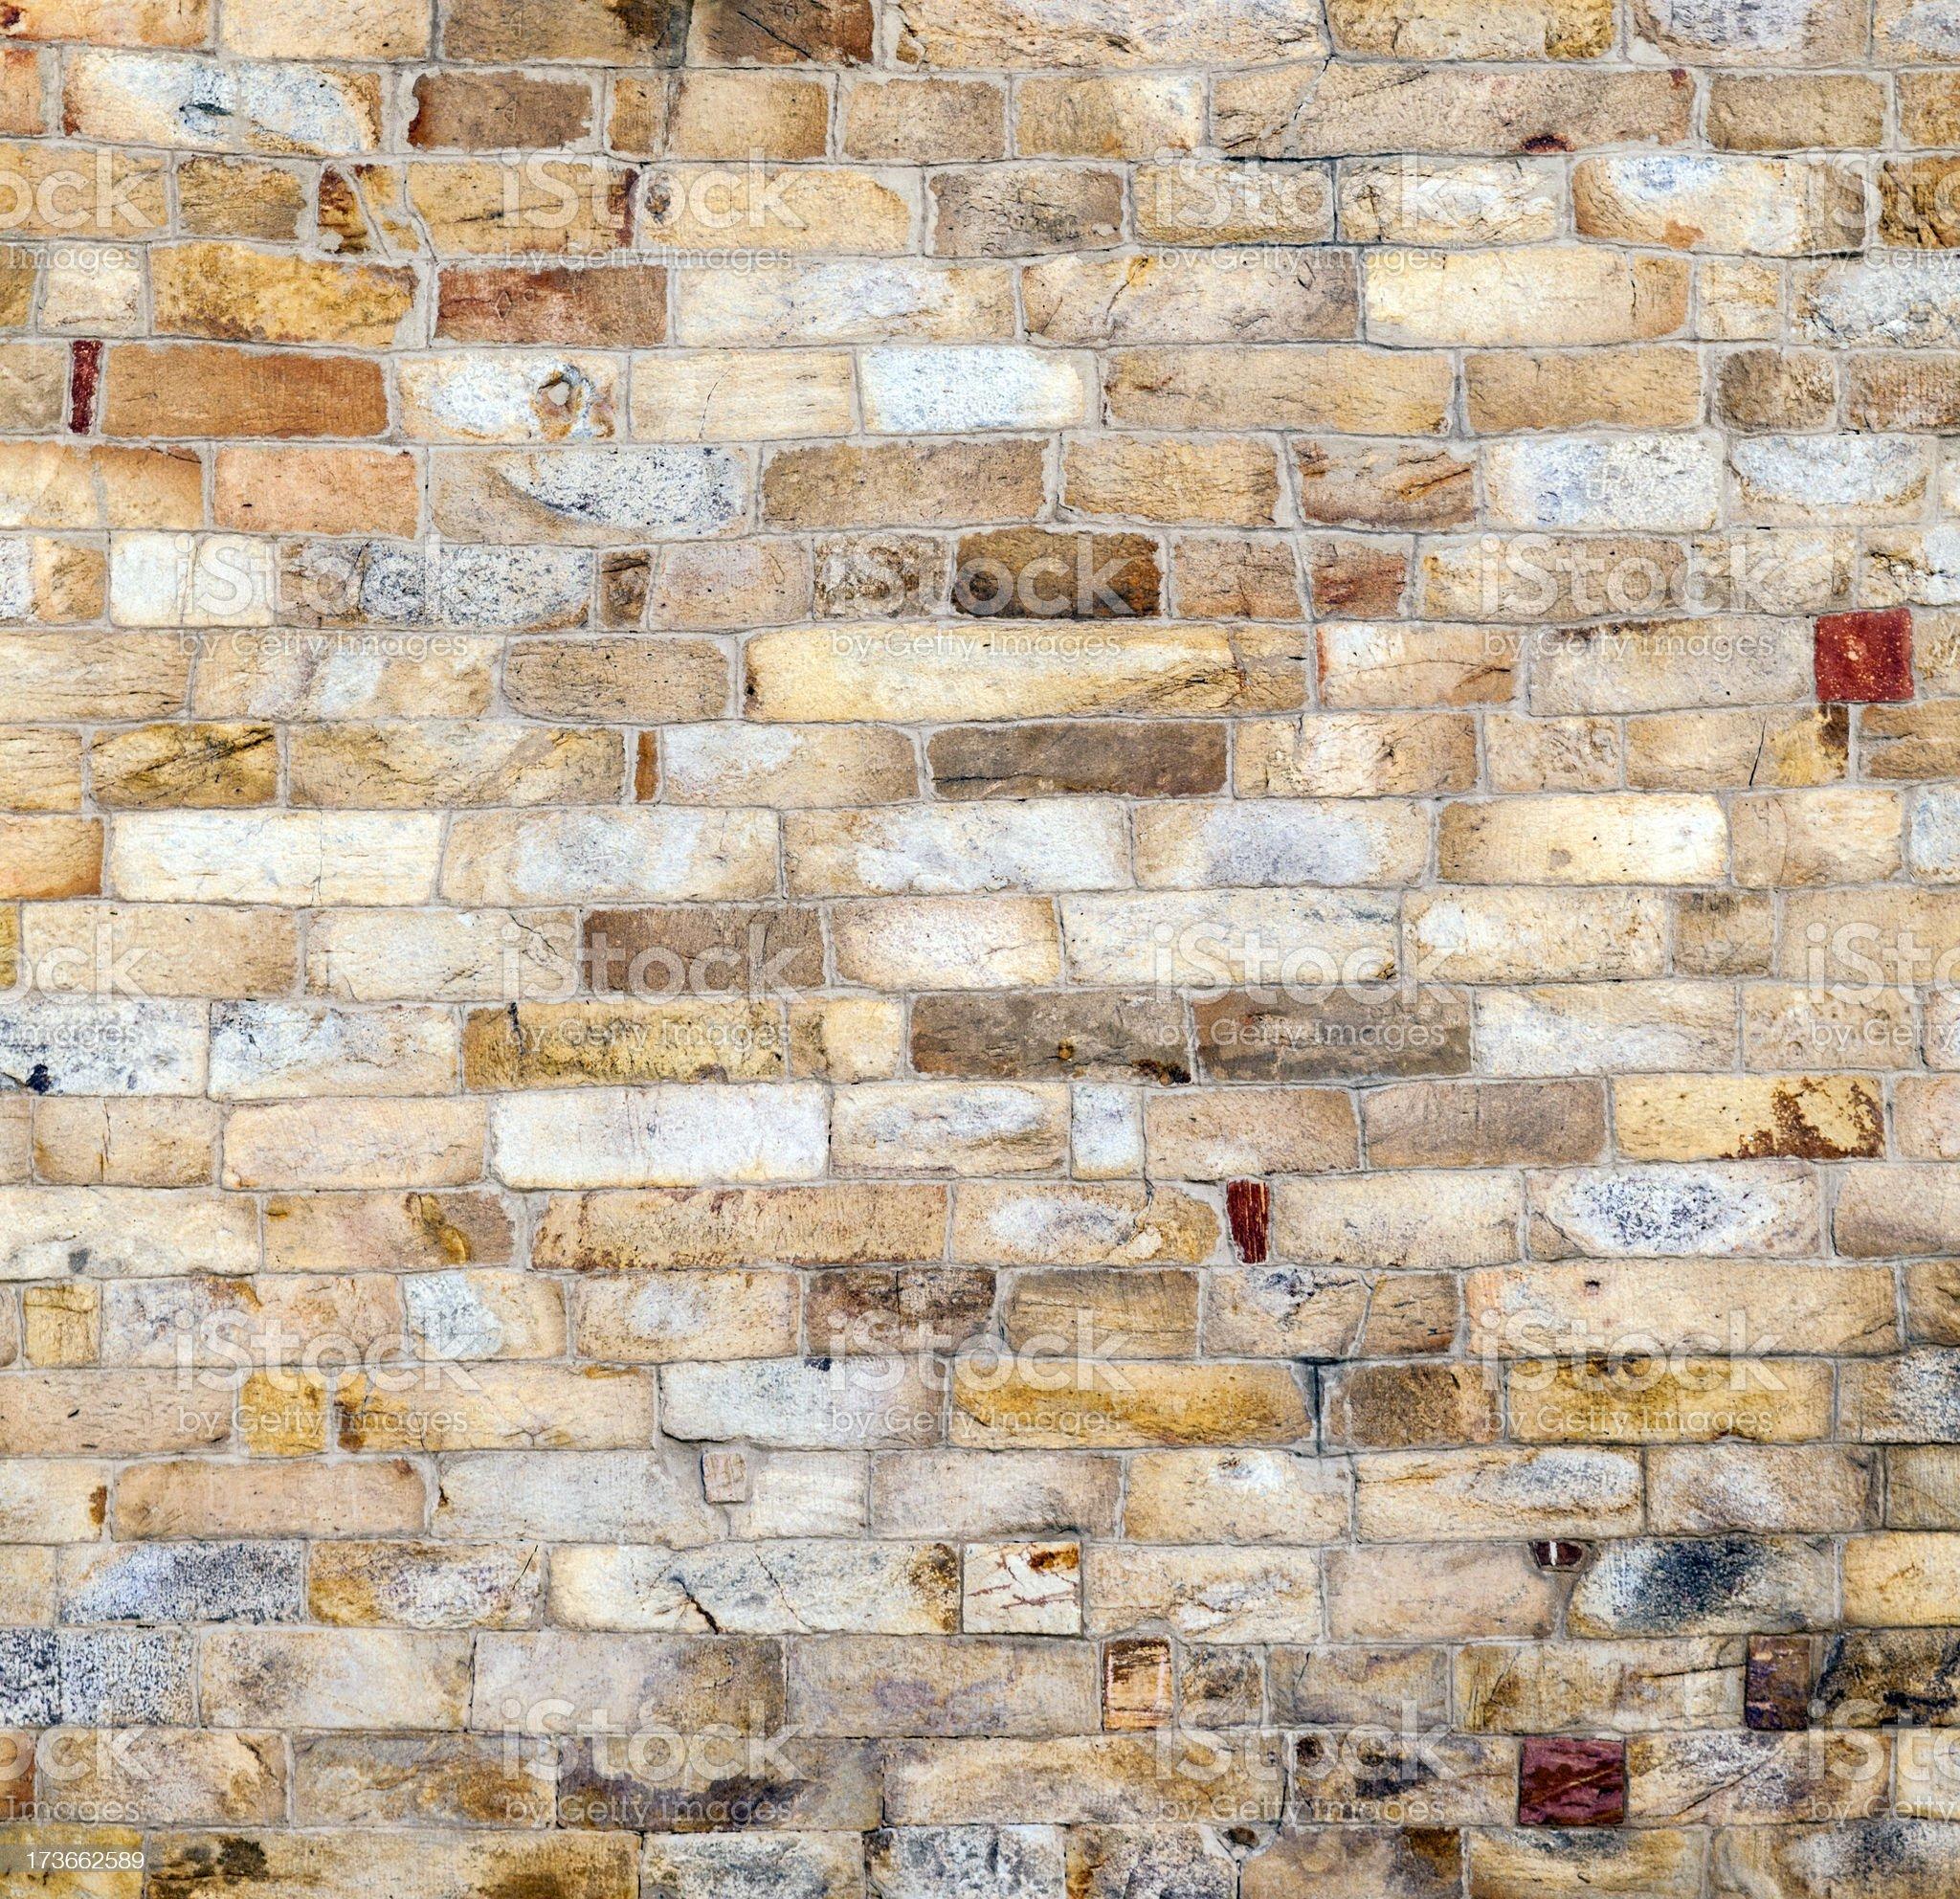 stones at the wall of Qutub Minar Tower royalty-free stock photo